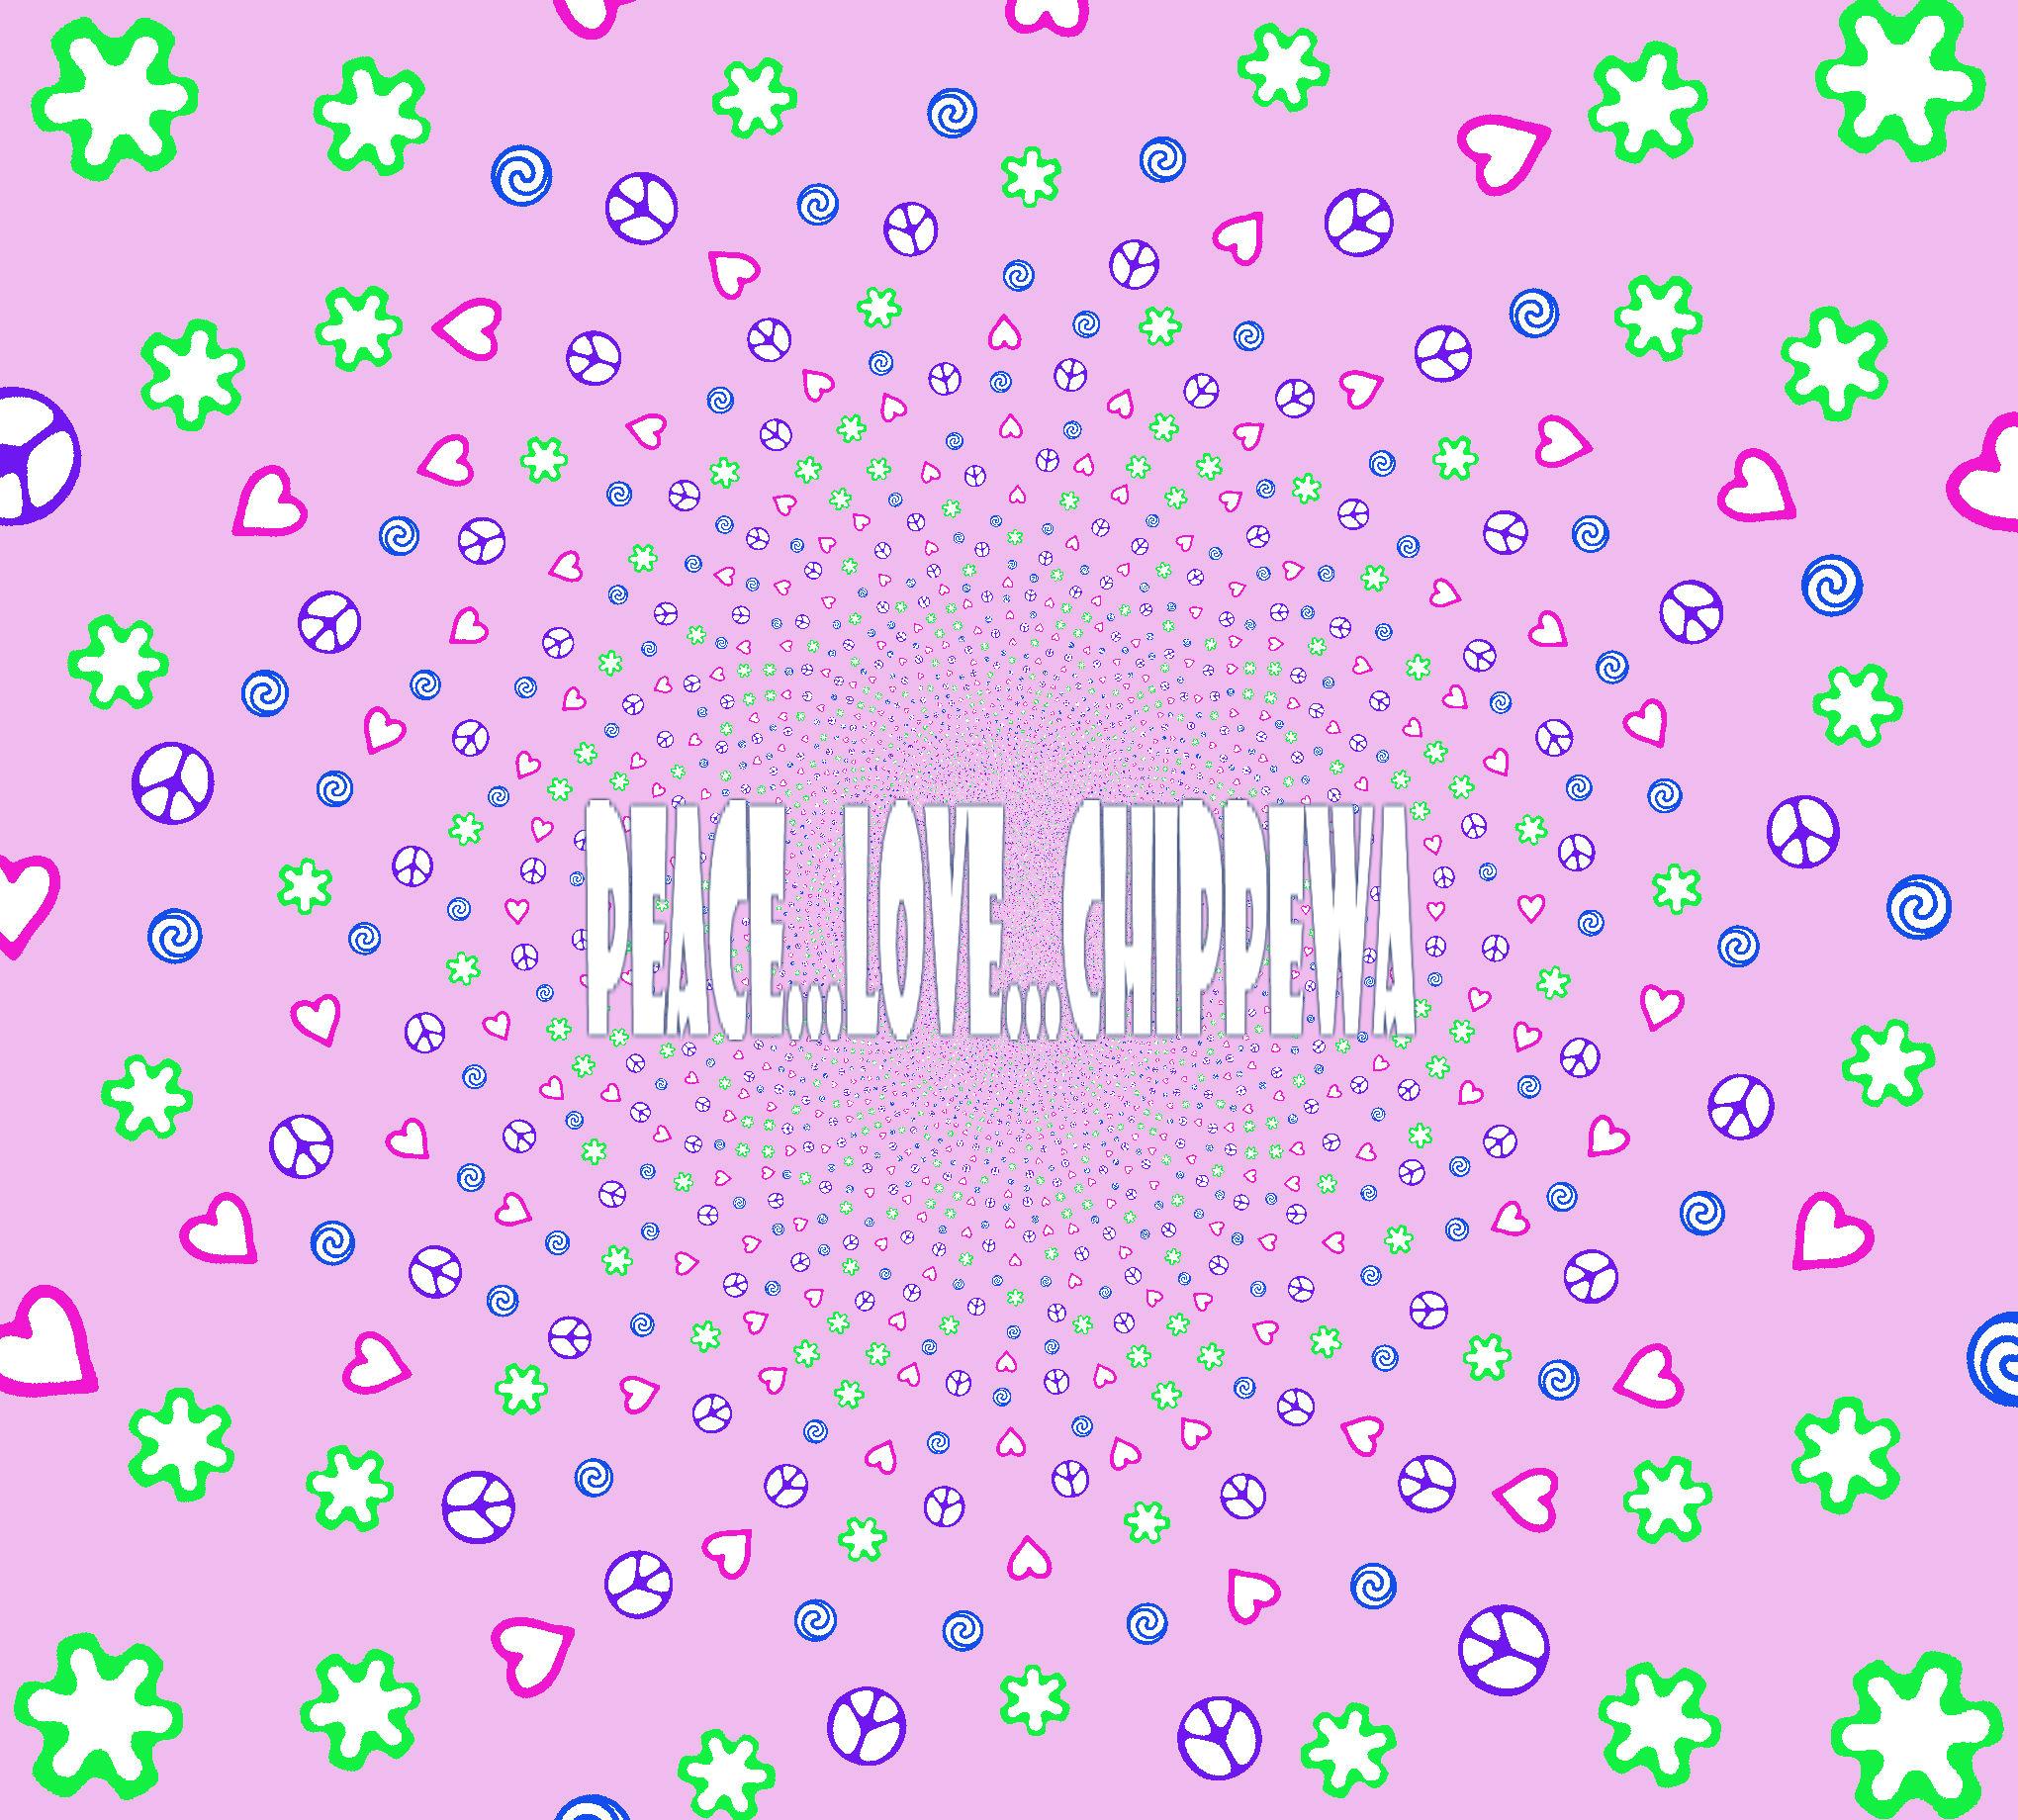 PEACE...LOVE...CHIPPEWA (1)